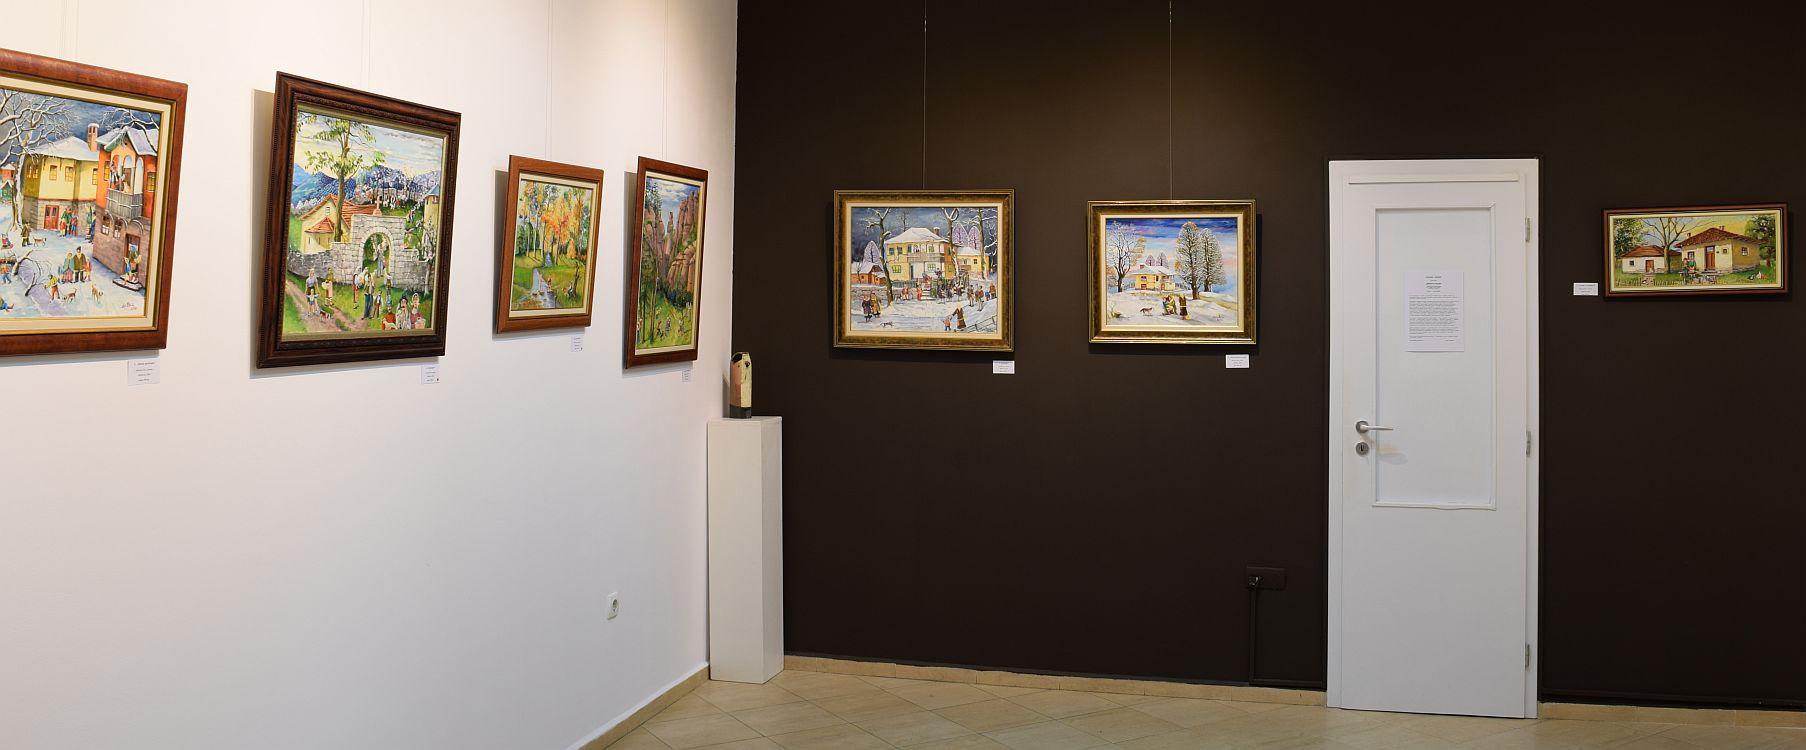 dimitar-vetsin-galeria-paris-2016